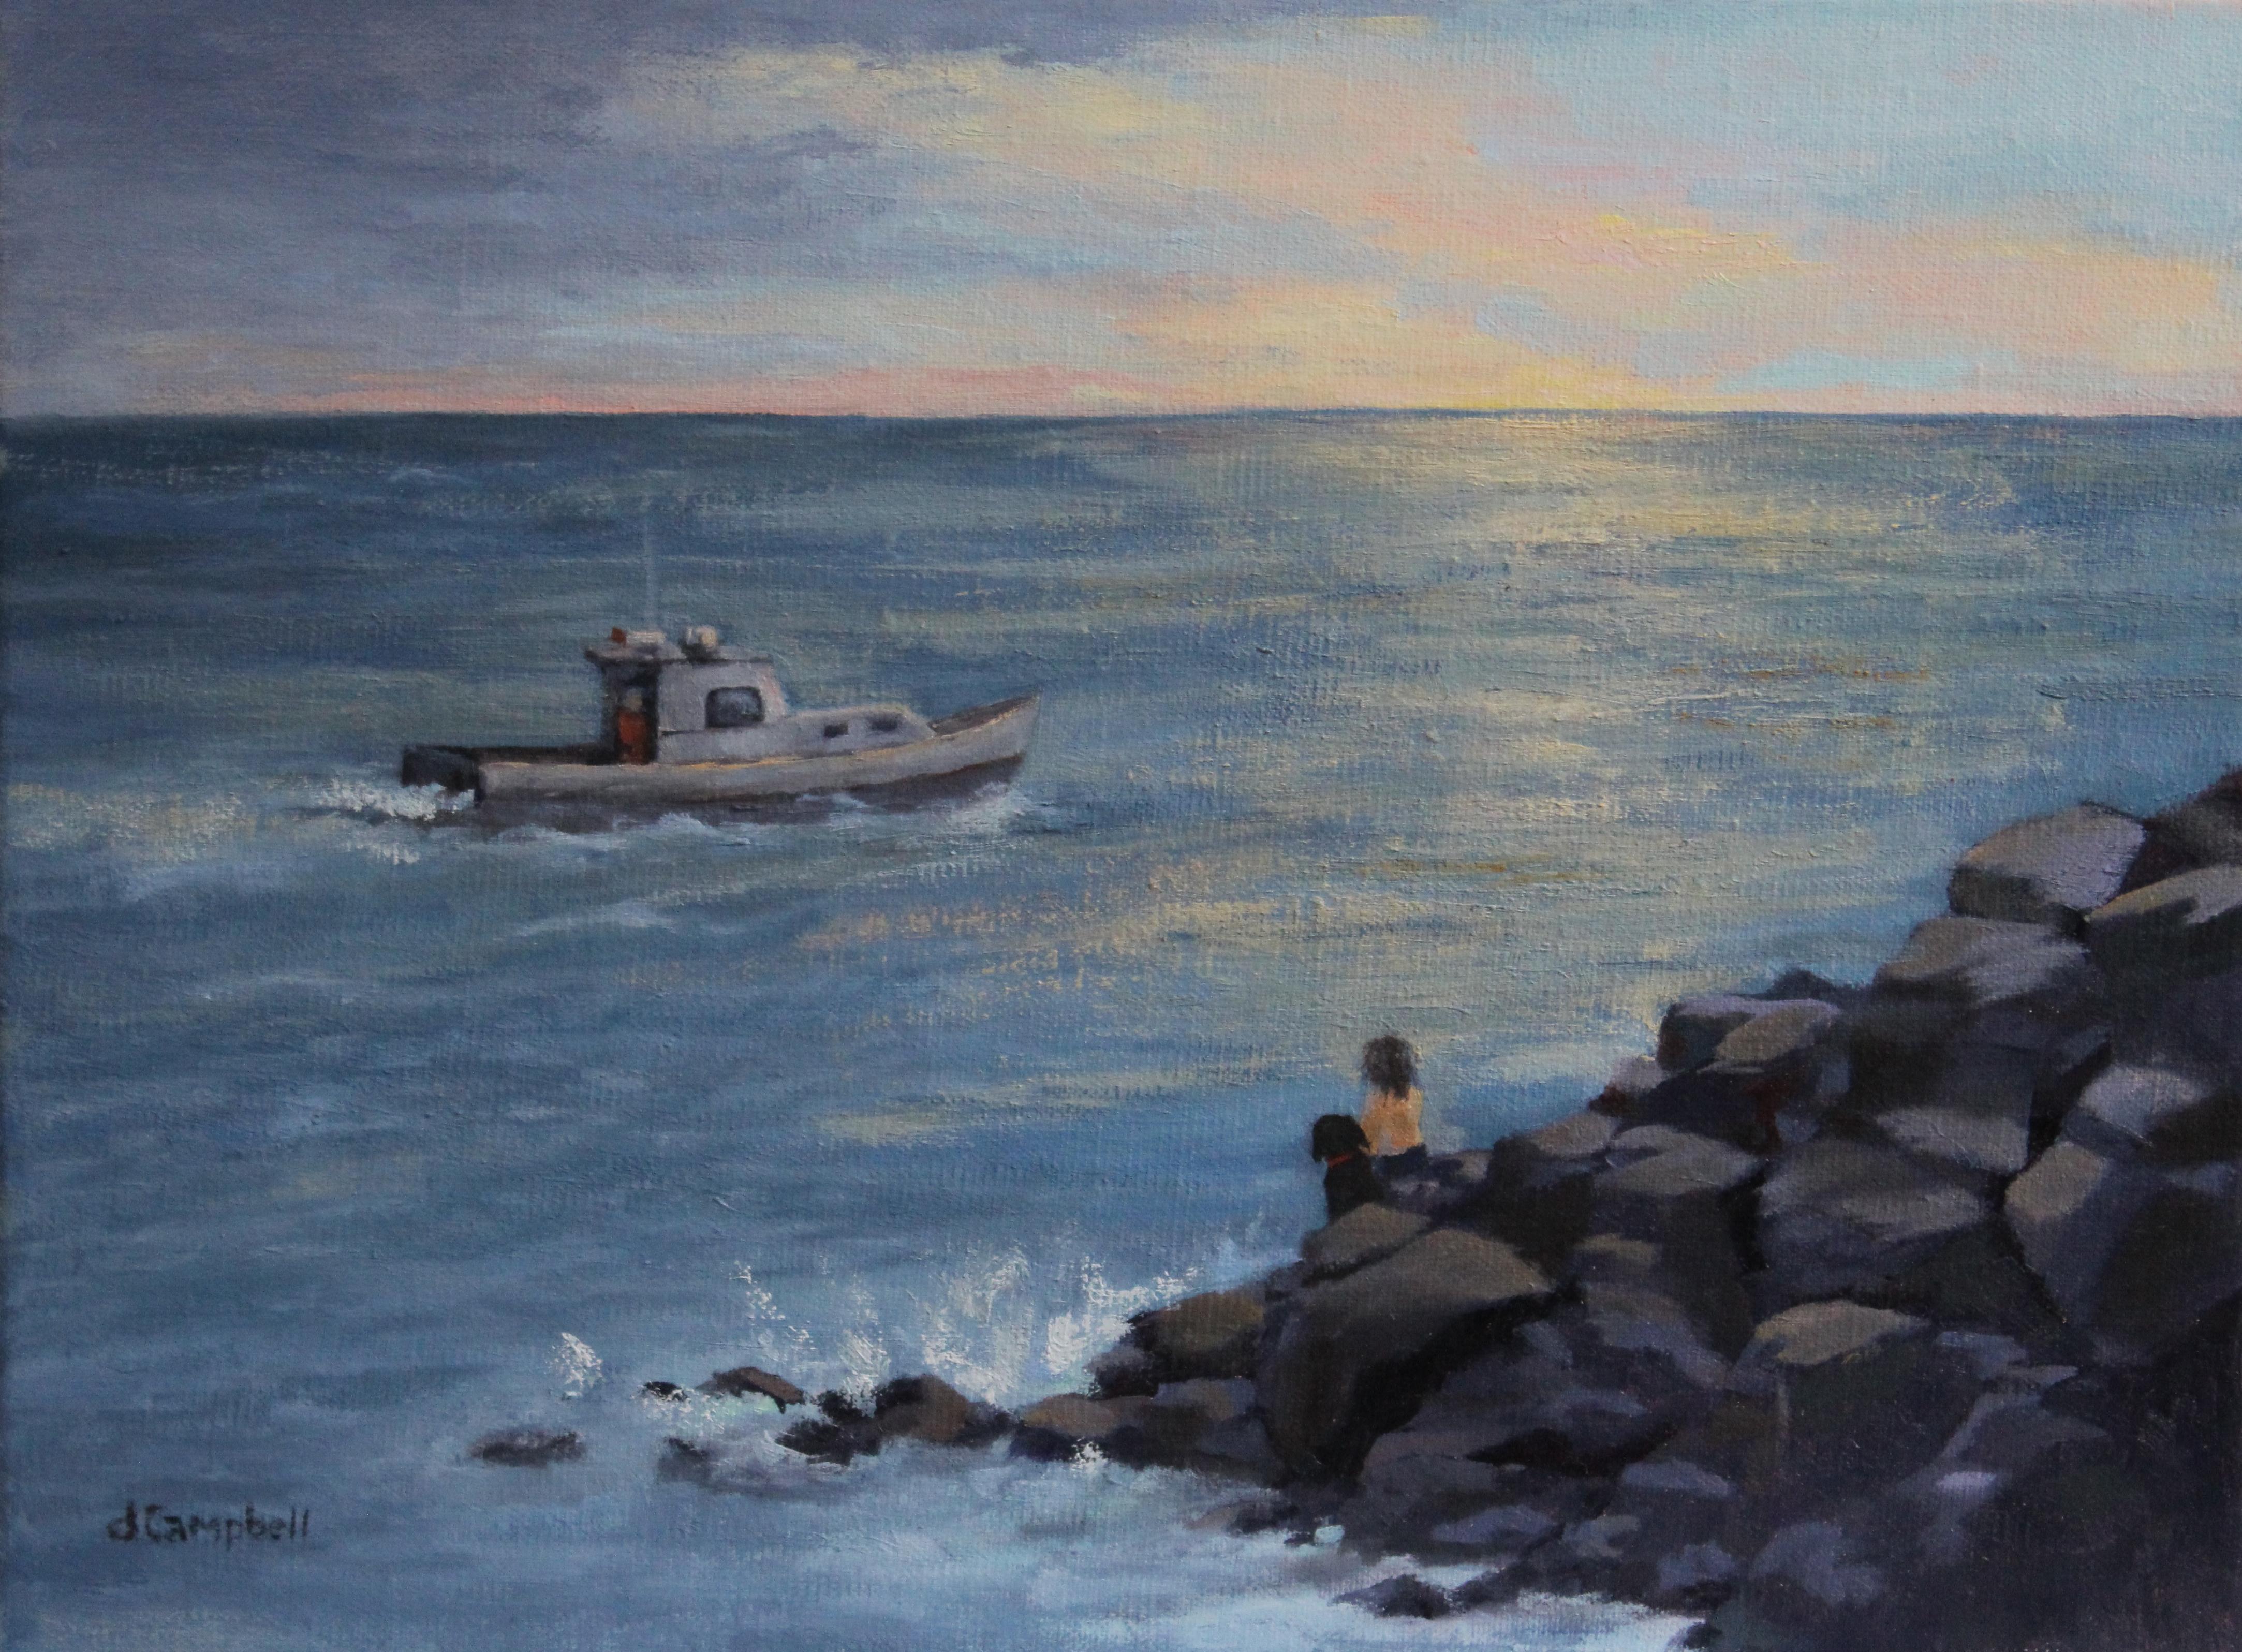 Fisherman heading out, Monhegan Ishalnd, Maine